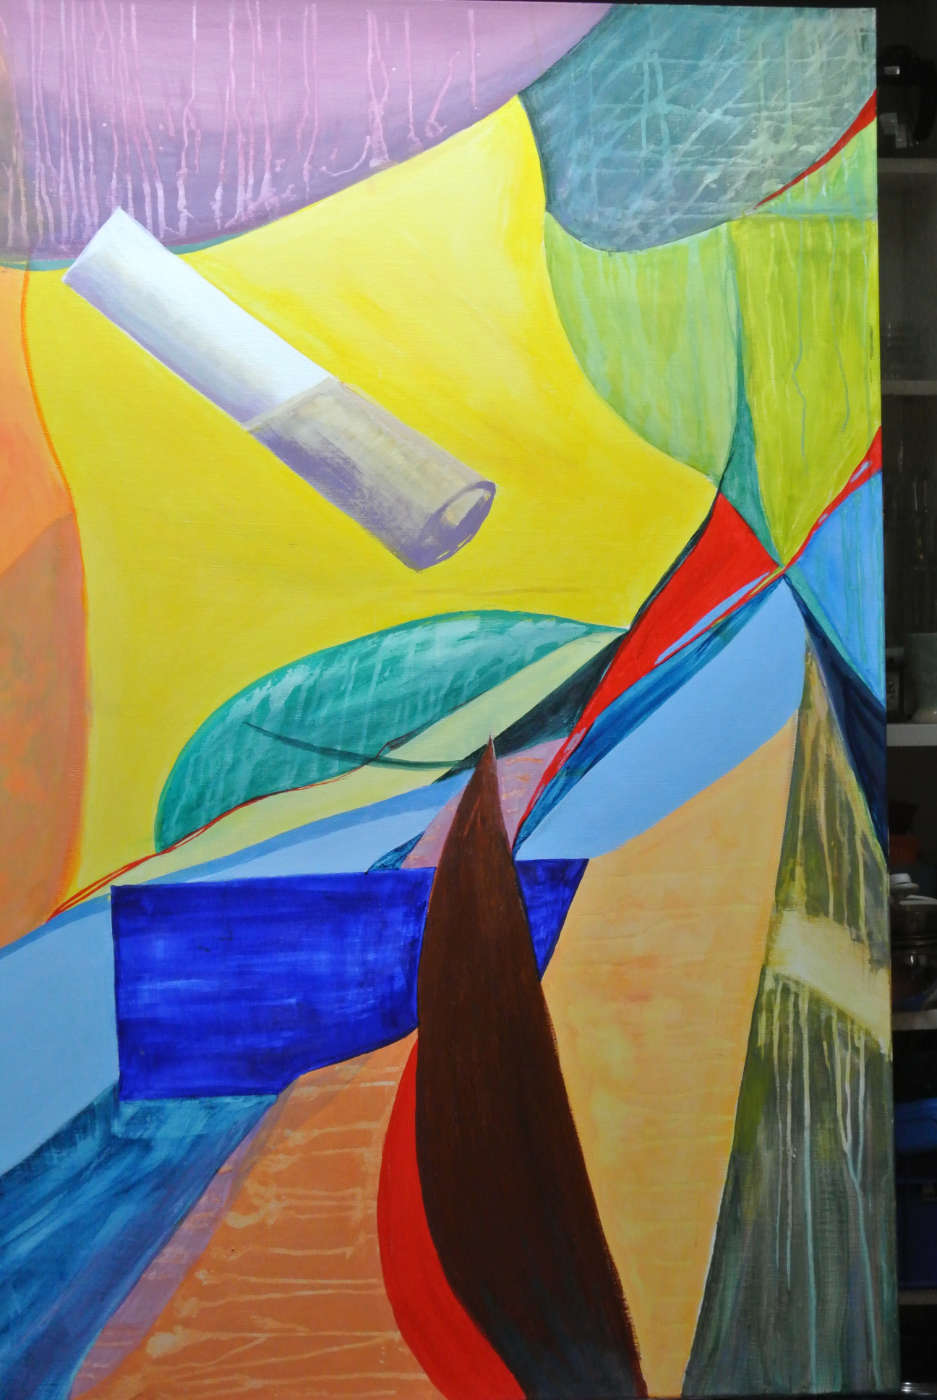 ohne Titel - Acryl auf Leinwand, 150 x 100 cm